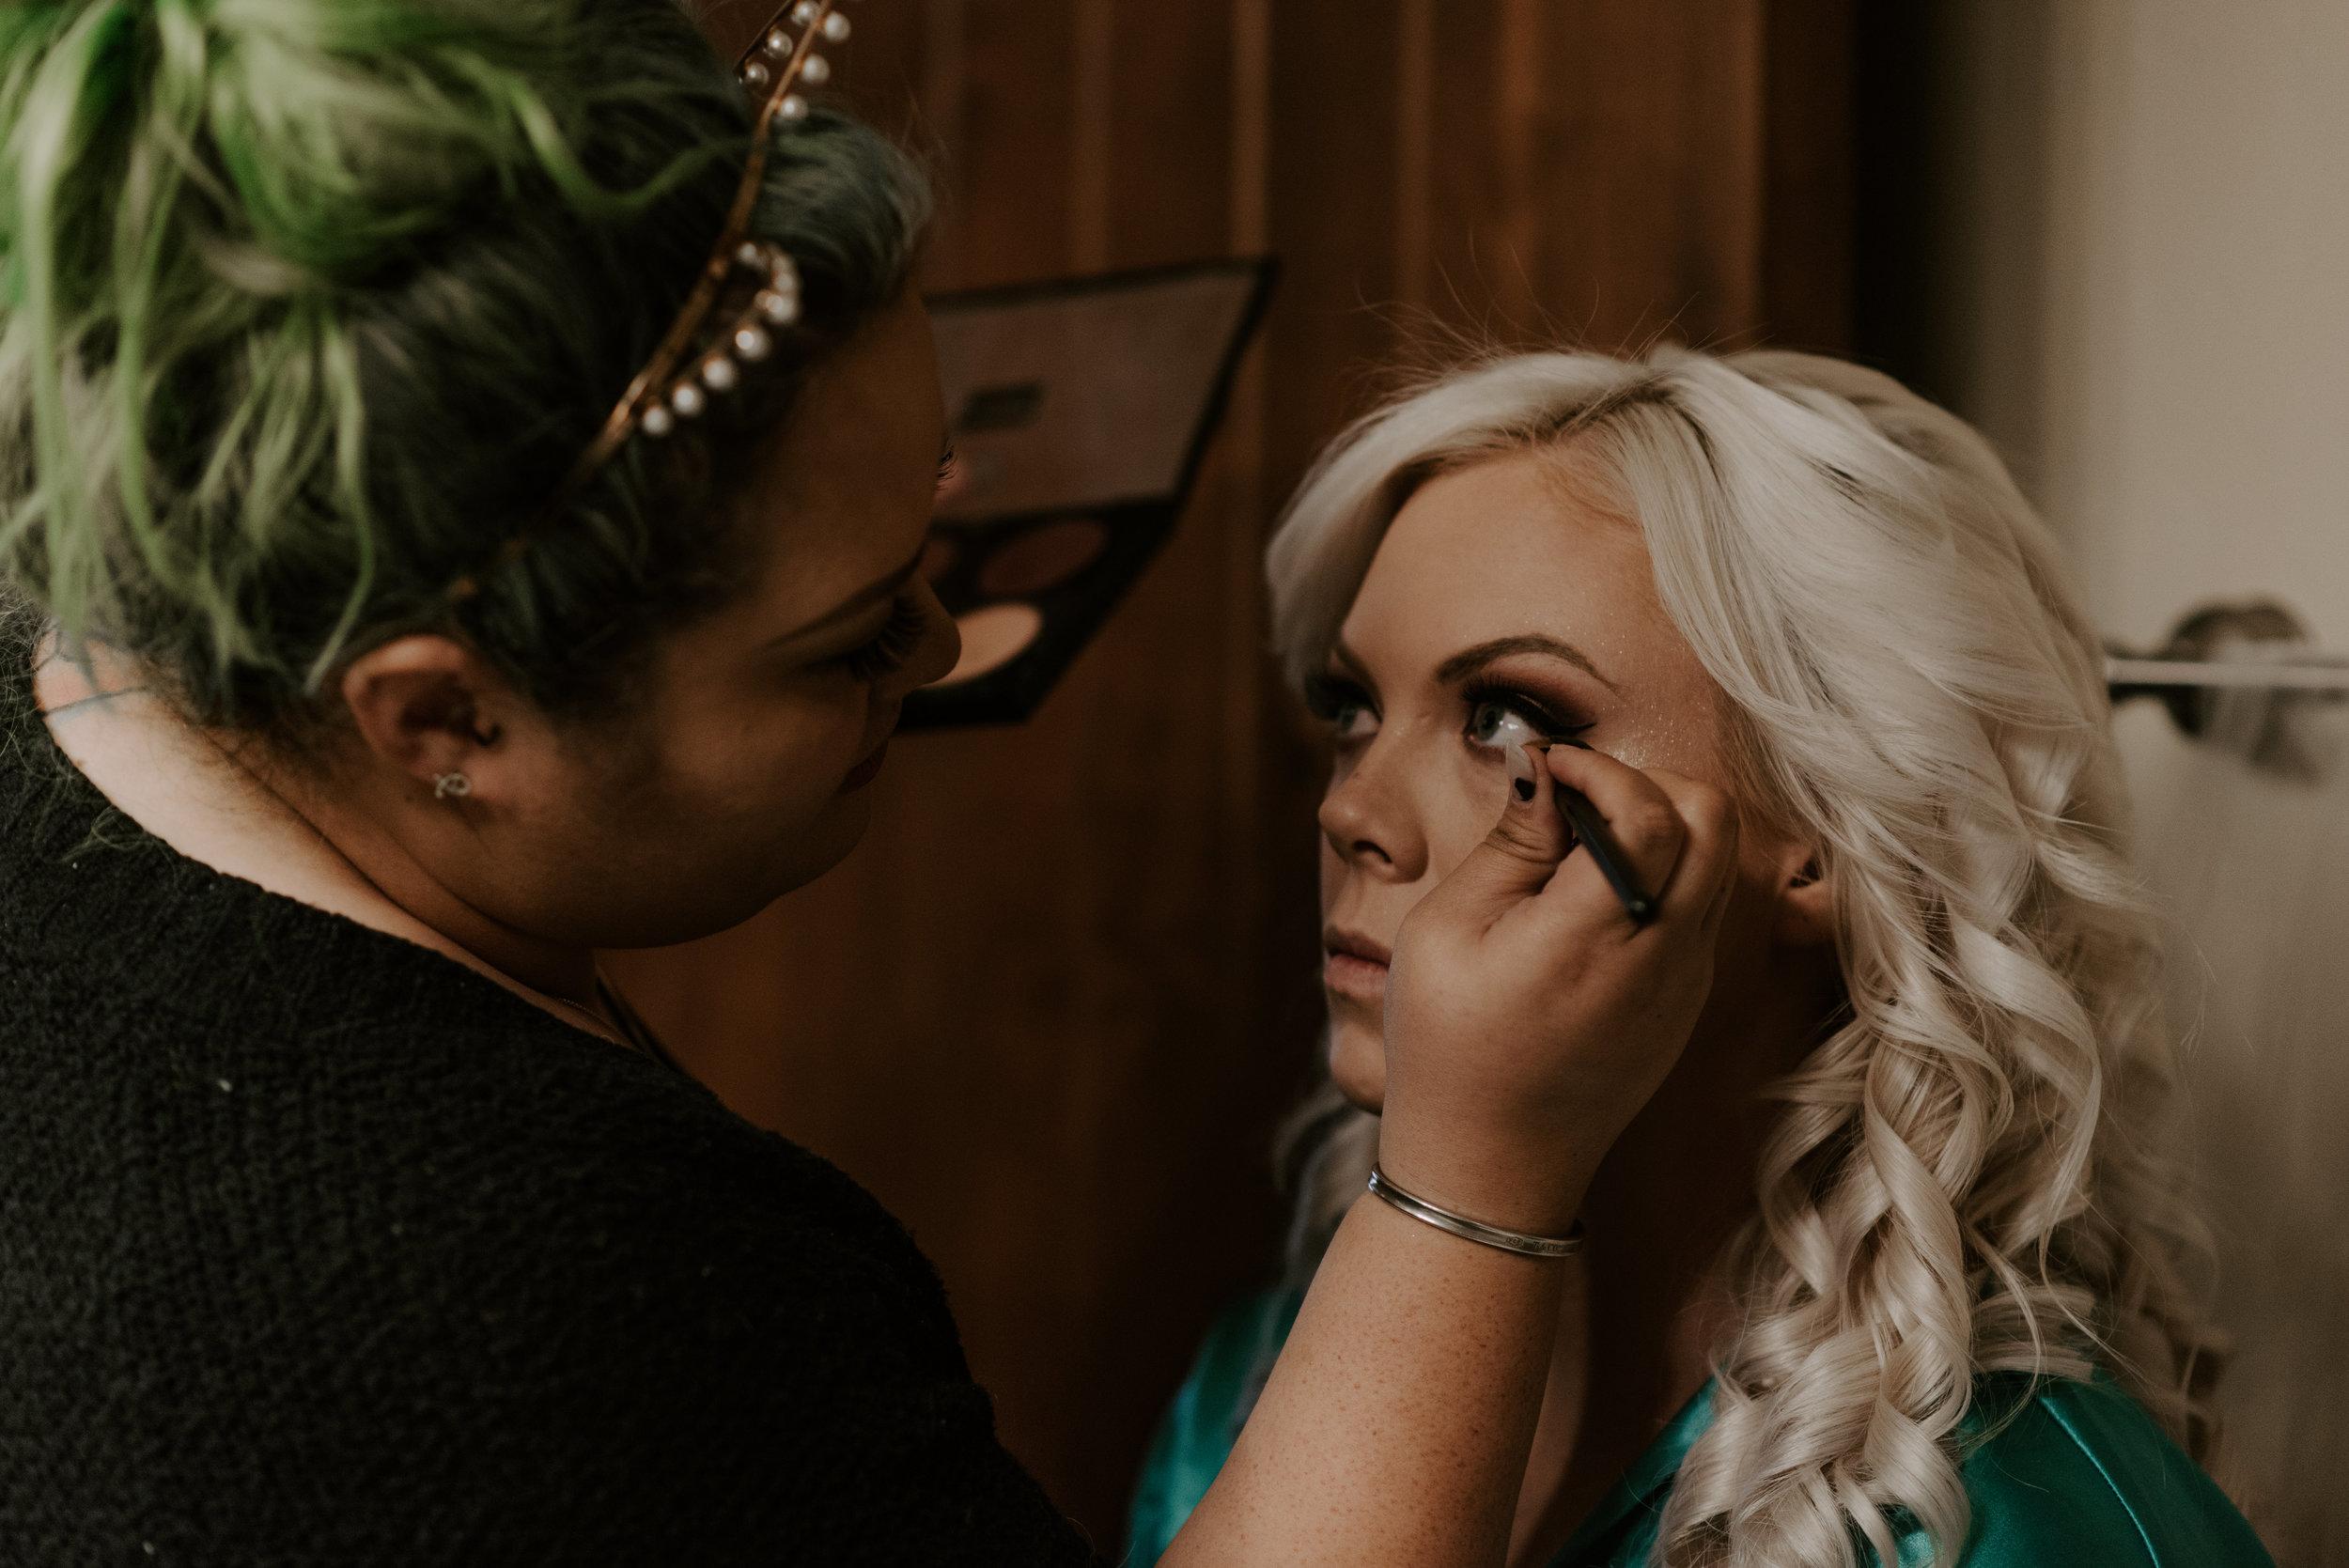 Bridge getting her makeup done before her wedding in Colorado.